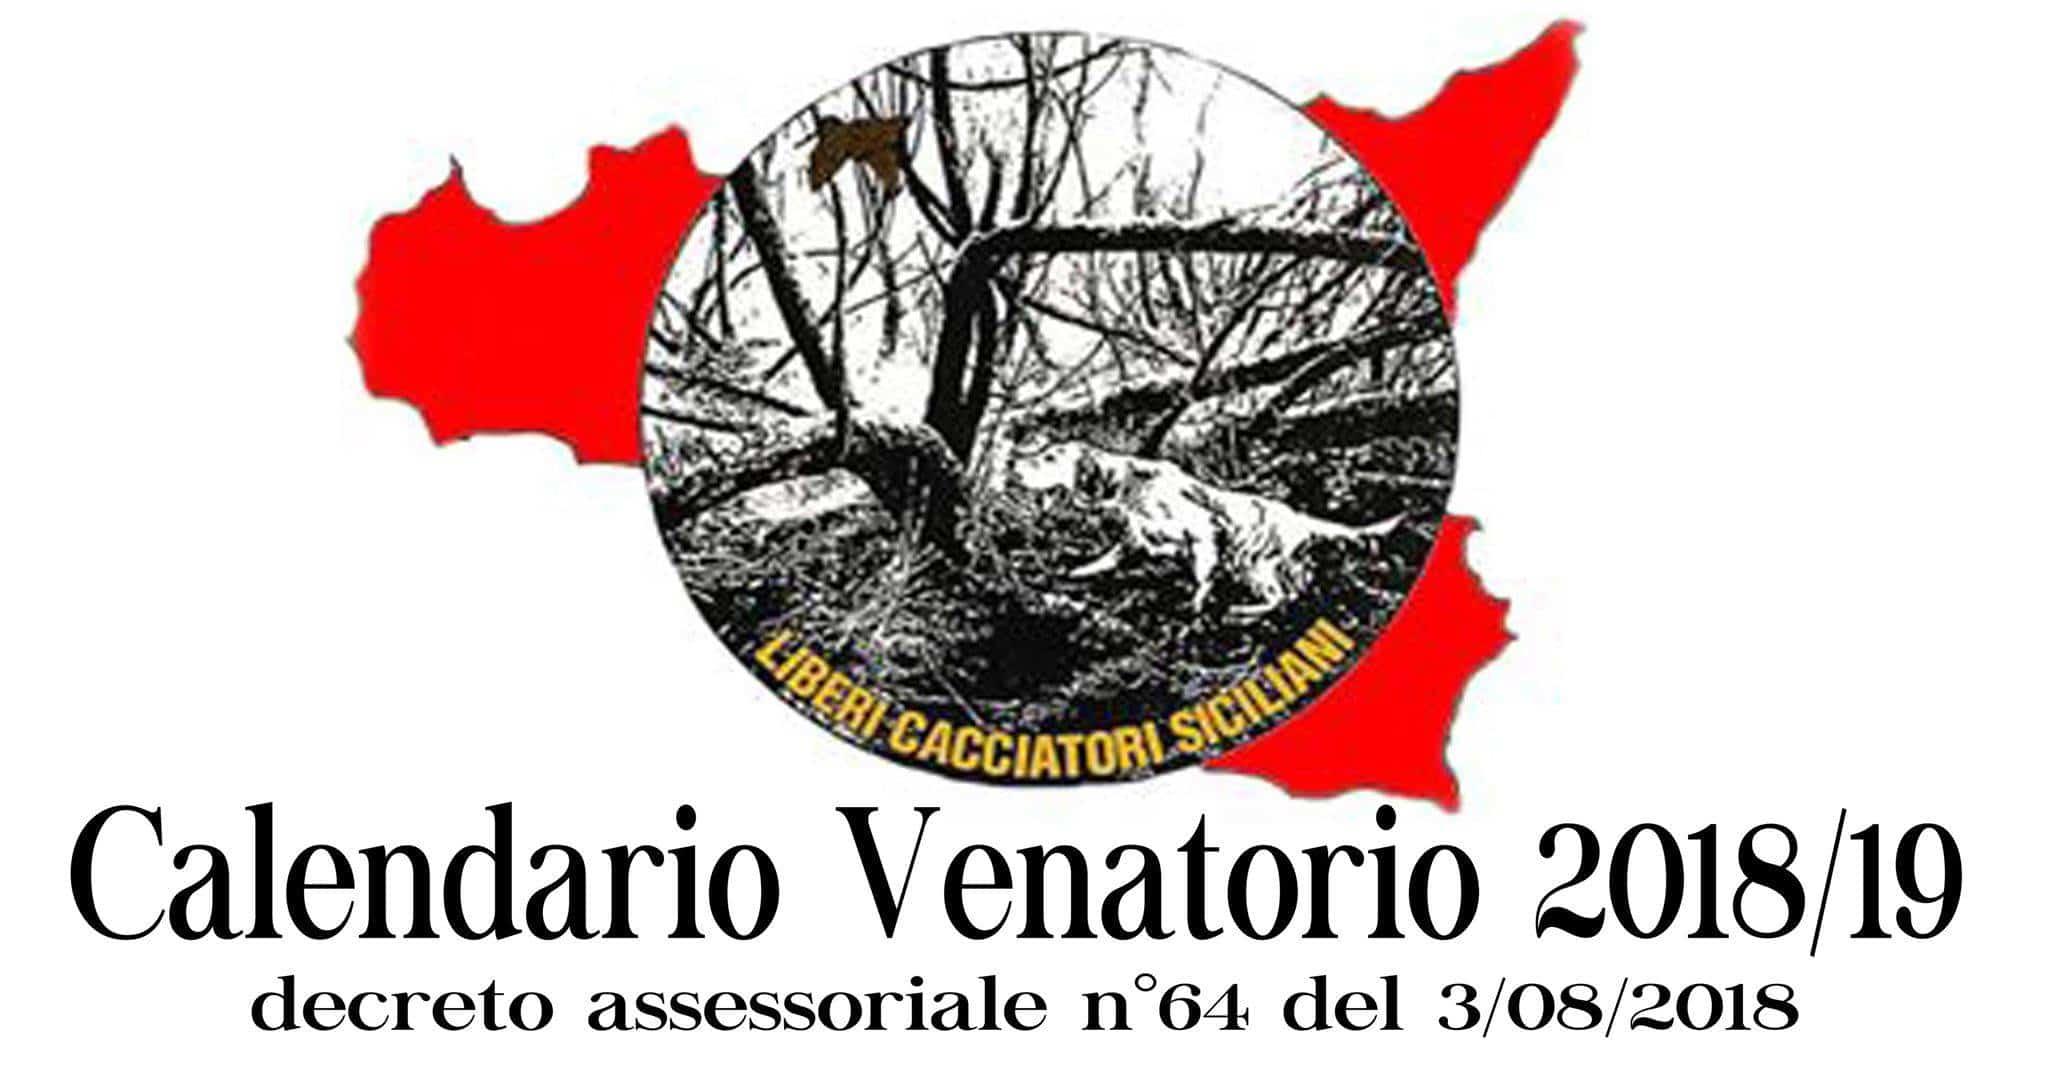 Calendario Venatorio Sicilia.Calendario Venatorio Regione Sicilia 2018 19 Liberi